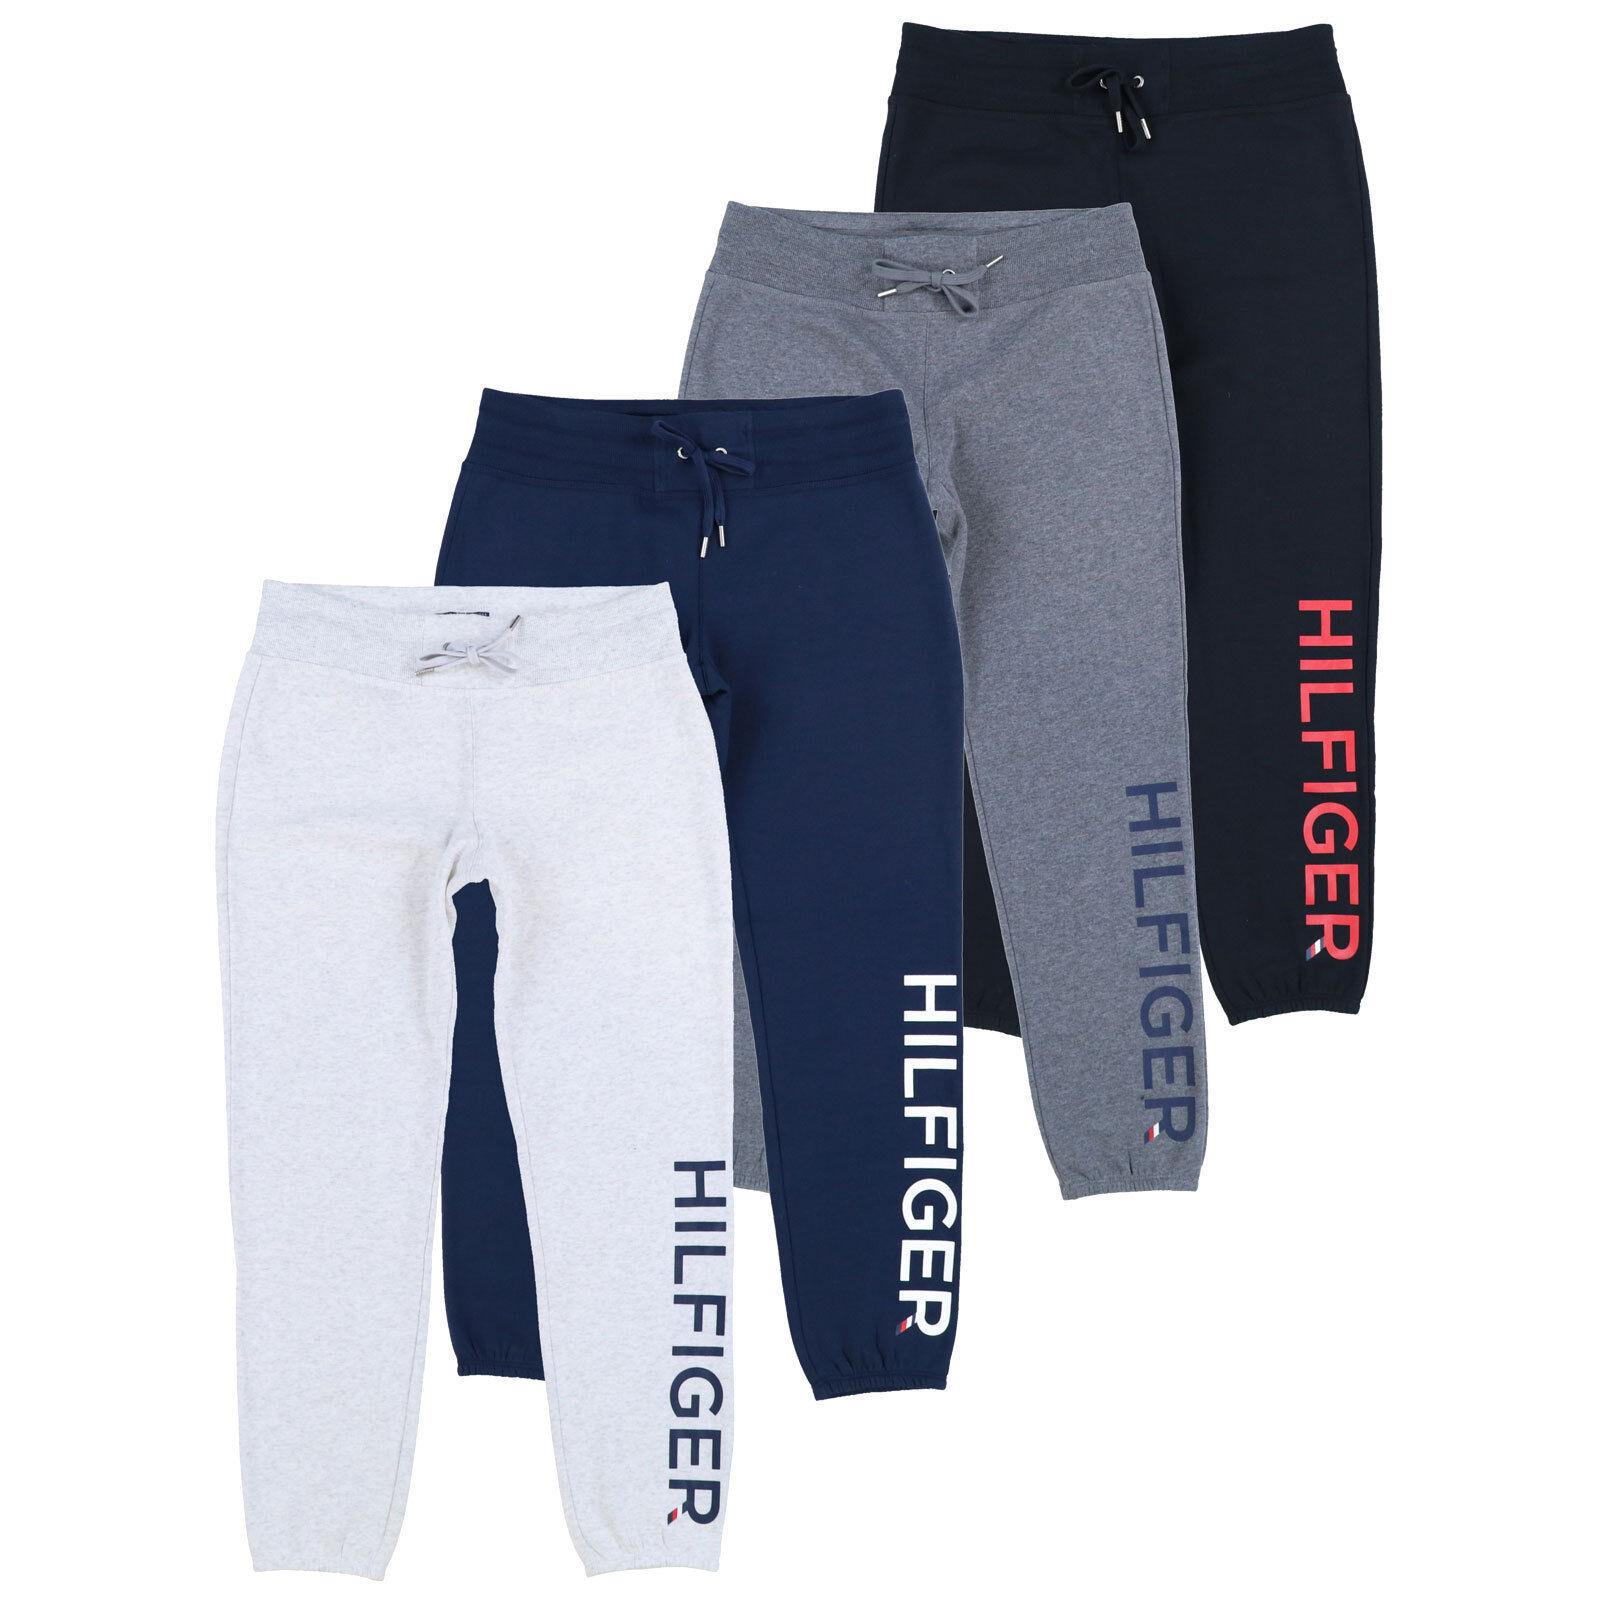 Tommy Hilfiger Womens Jogger Sweatpants Lounge Wear Logo Ath